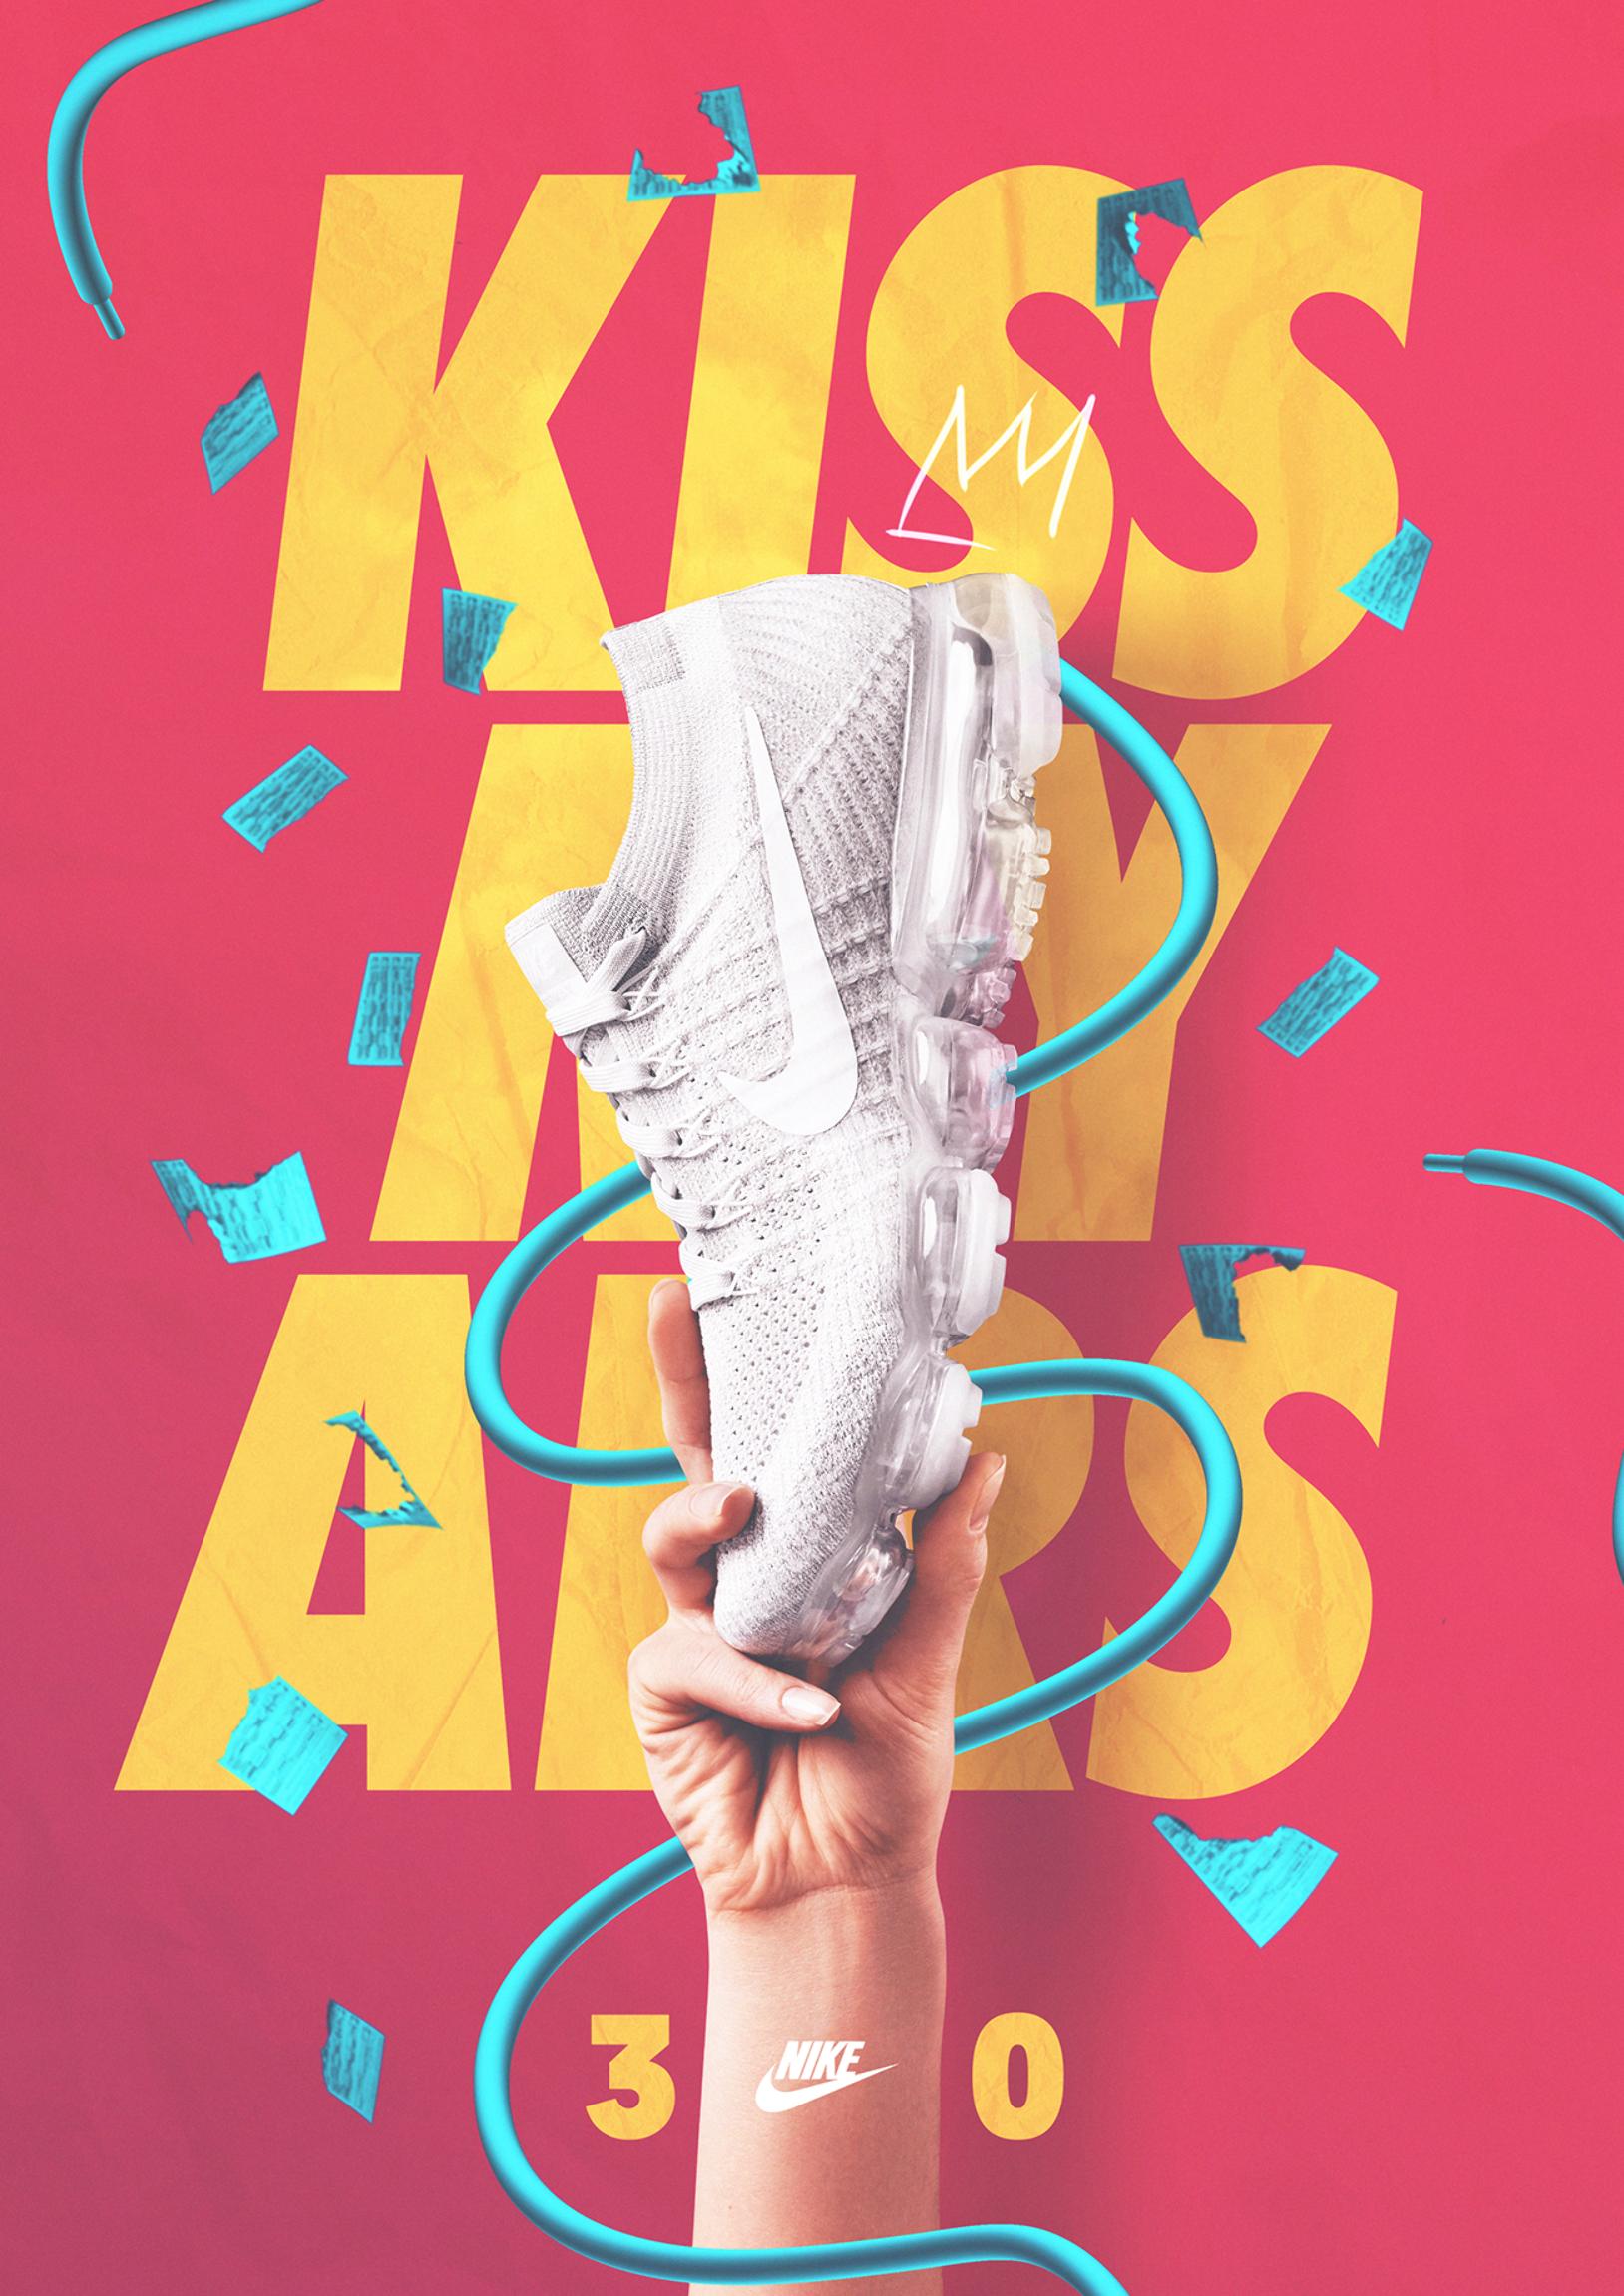 Nike Air Max Day Design Contest 2017 |